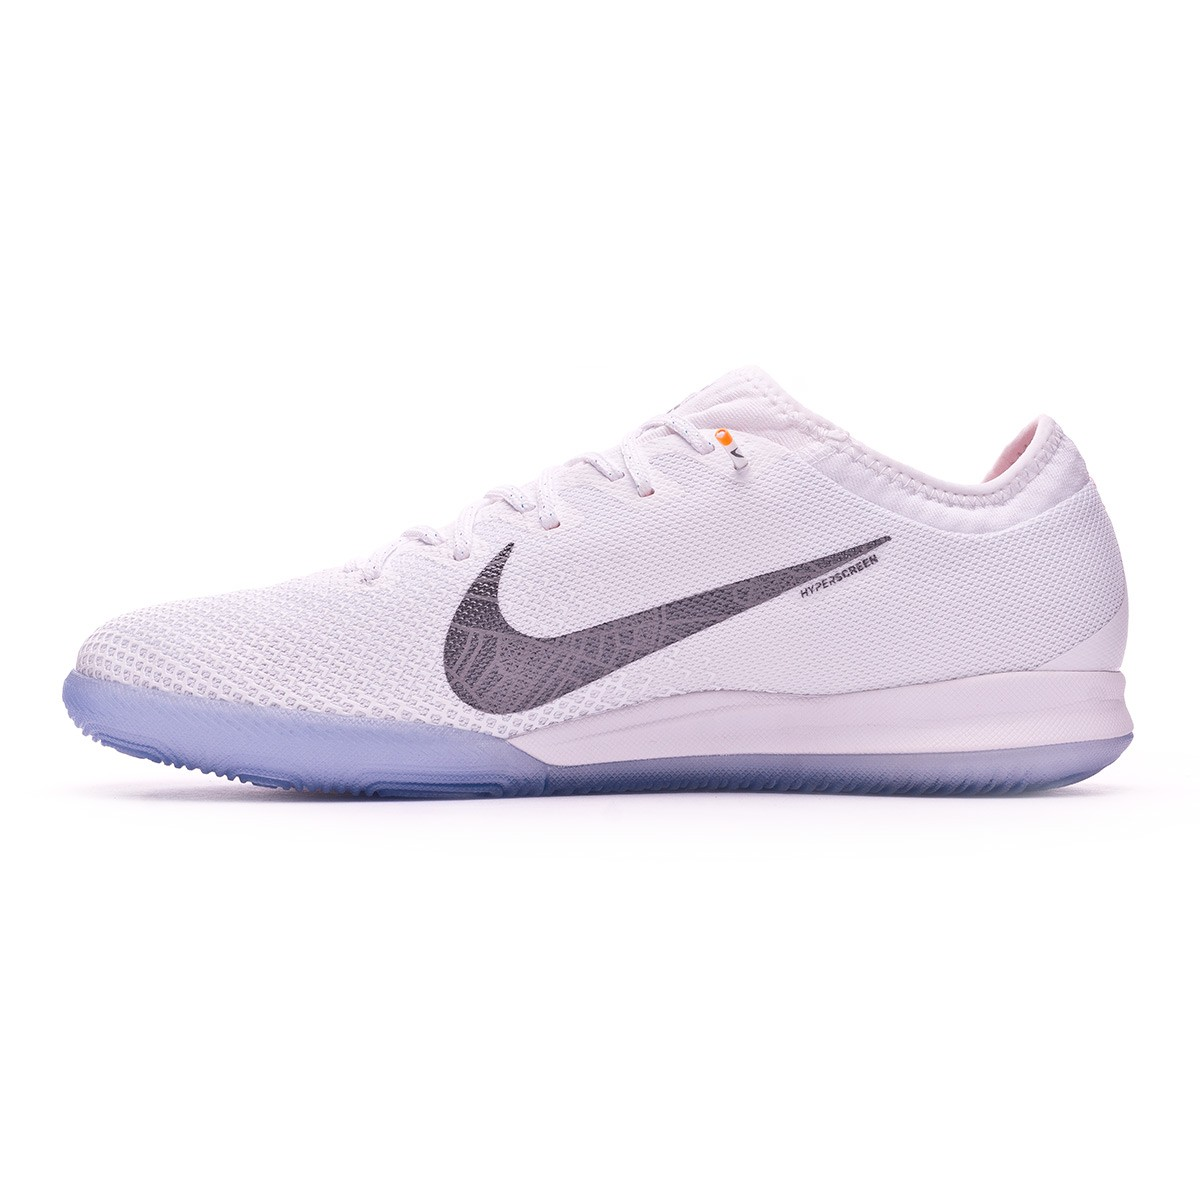 ebd39940e Futsal Boot Nike Mercurial VaporX XII Pro IC White-Metallic cool grey-Total  orange - Football store Fútbol Emotion